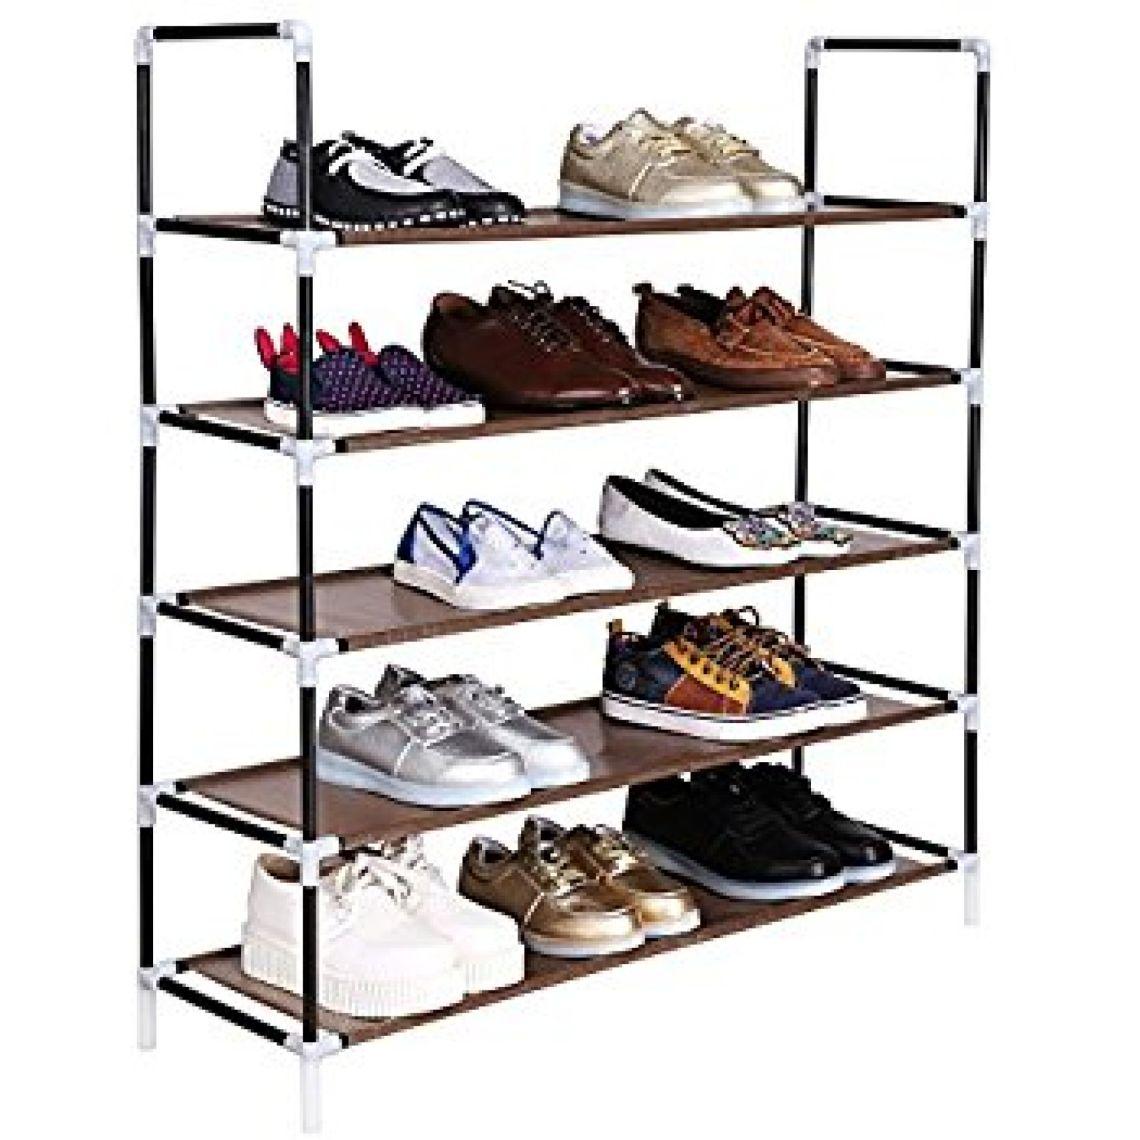 Amazon.com: Leoneva 5 Tiers Shoe Rack 25 Pairs Stand Shelf Shoes Organizer Storage Shoe Tower Organizer Cabinet: Home & Kitchen